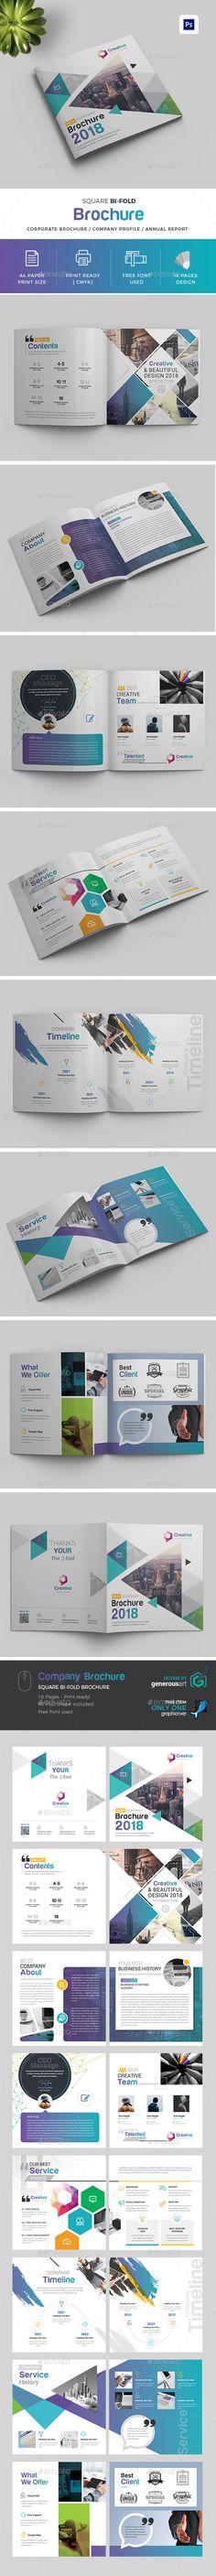 2018 Square BiFold Brochure #presentation #informational  • Download here → https://graphicriver.net/item/2018-square-bifold-brochure/20805679?ref=pxcr